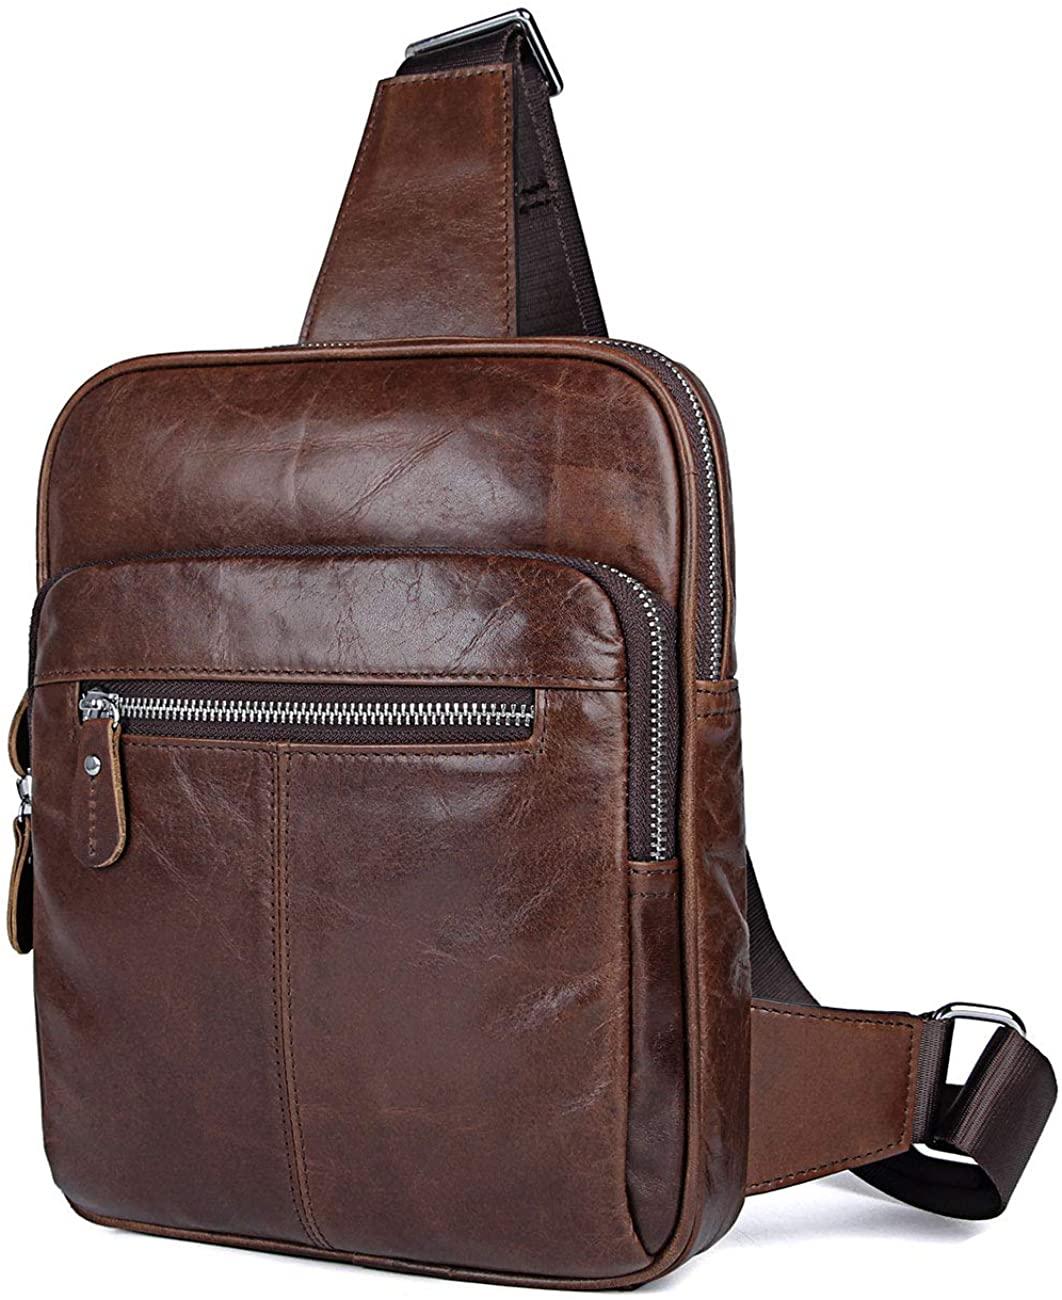 Leather Sling Backpack   Genuine Cowhide Leather Sling Crossbody Shoulder Bag for Men and Women   Dark Brown